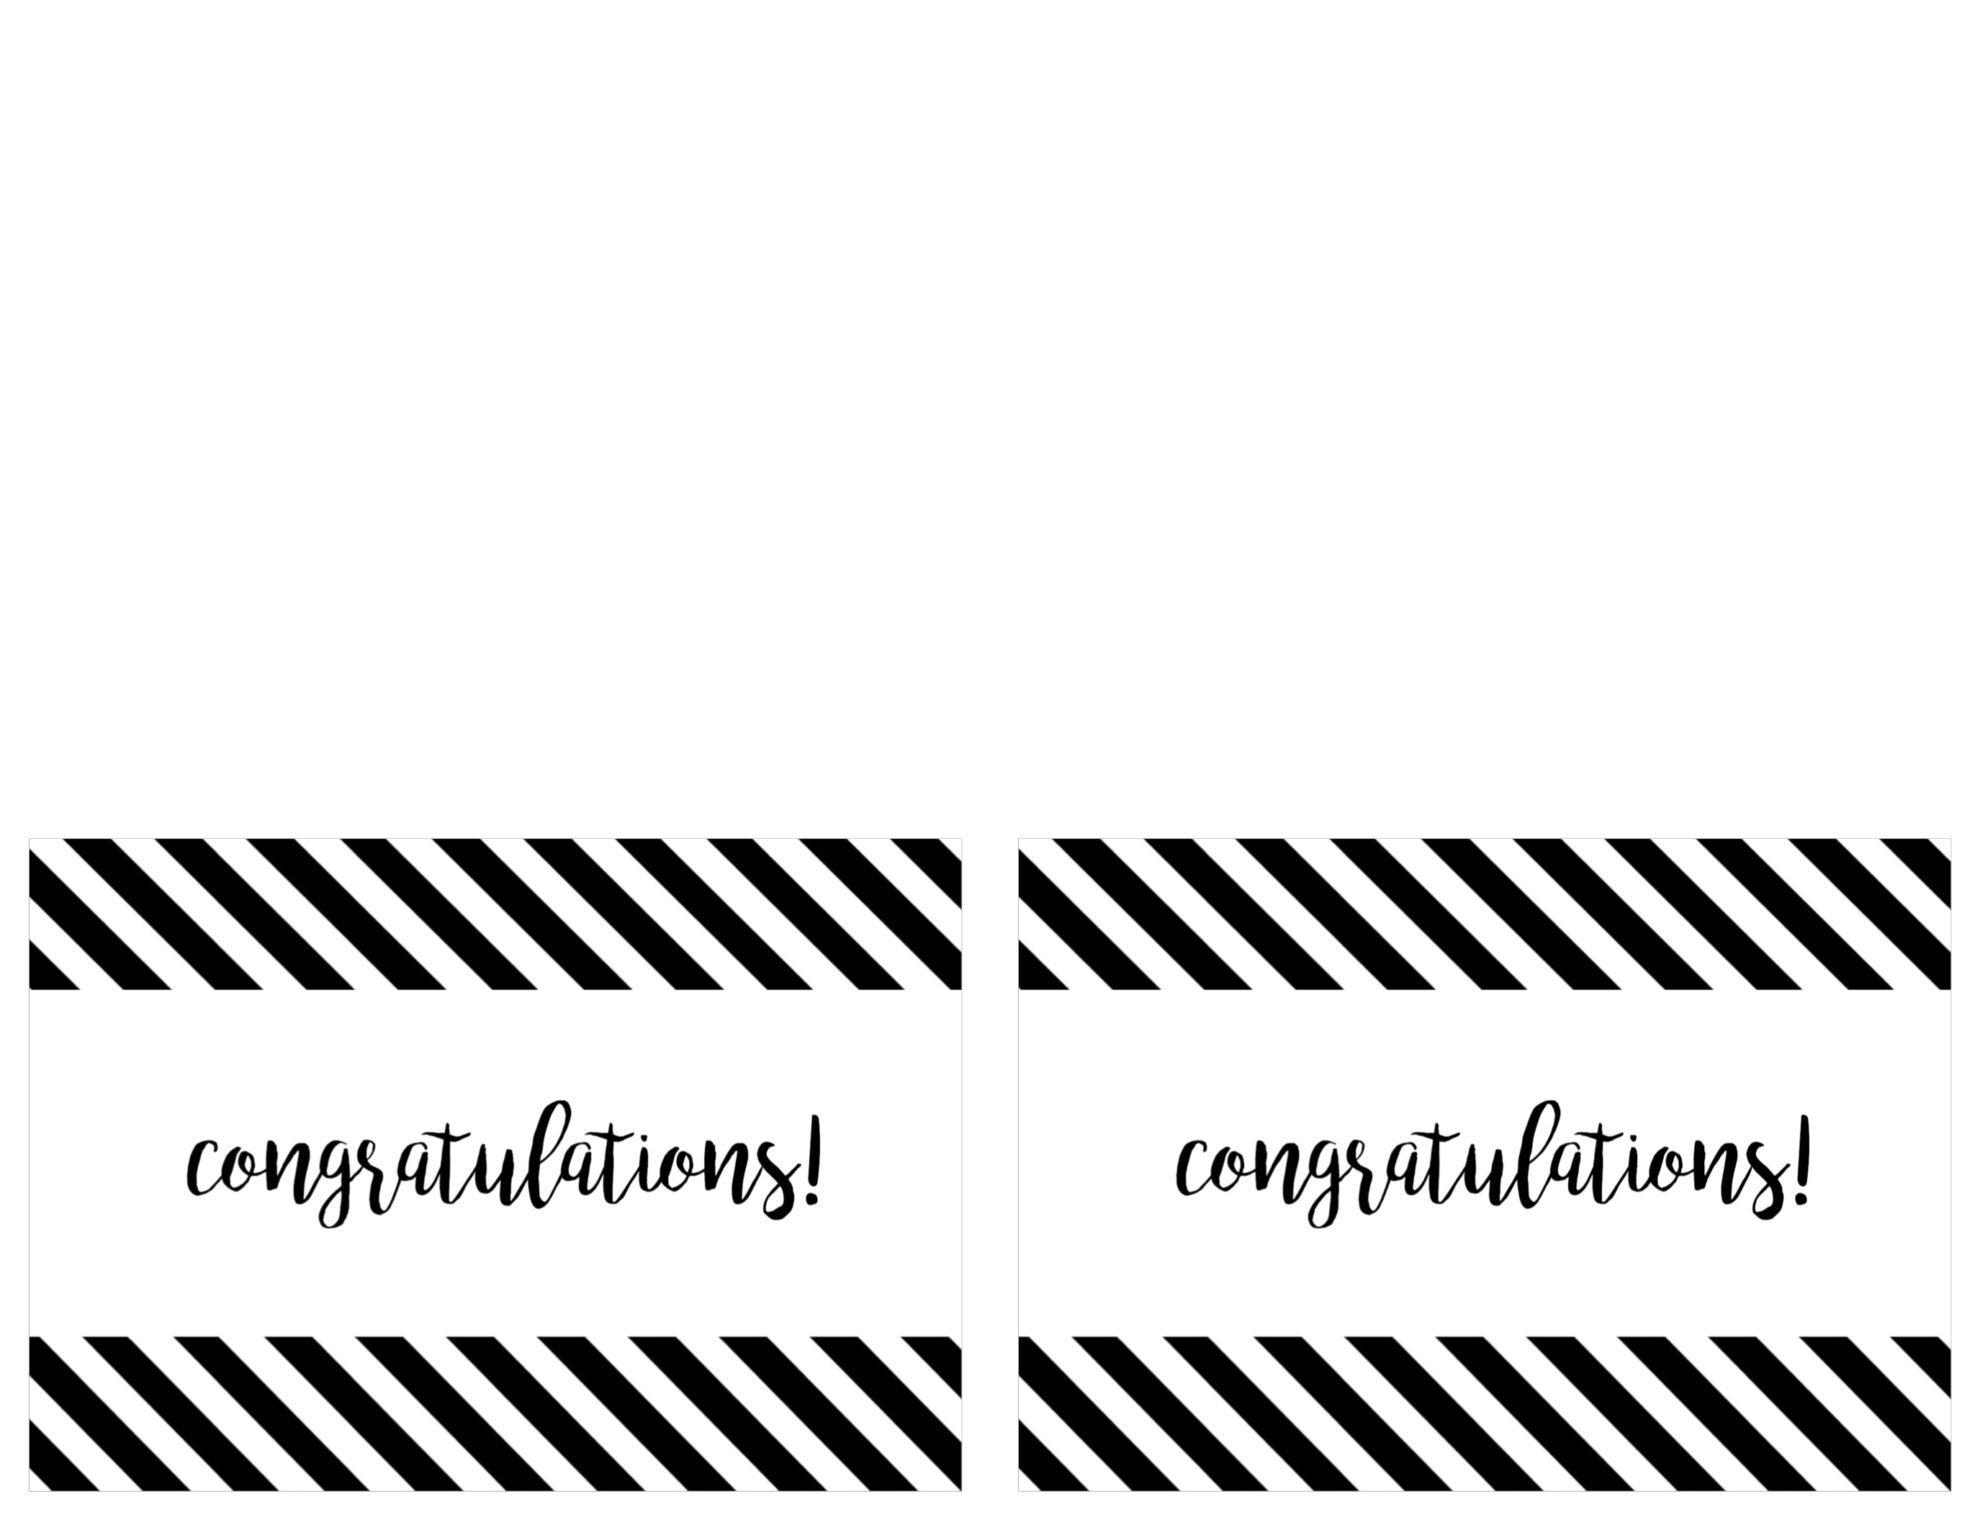 Free Printable Congratulations Card - Paper Trail Design - Free Printable Congratulations Cards